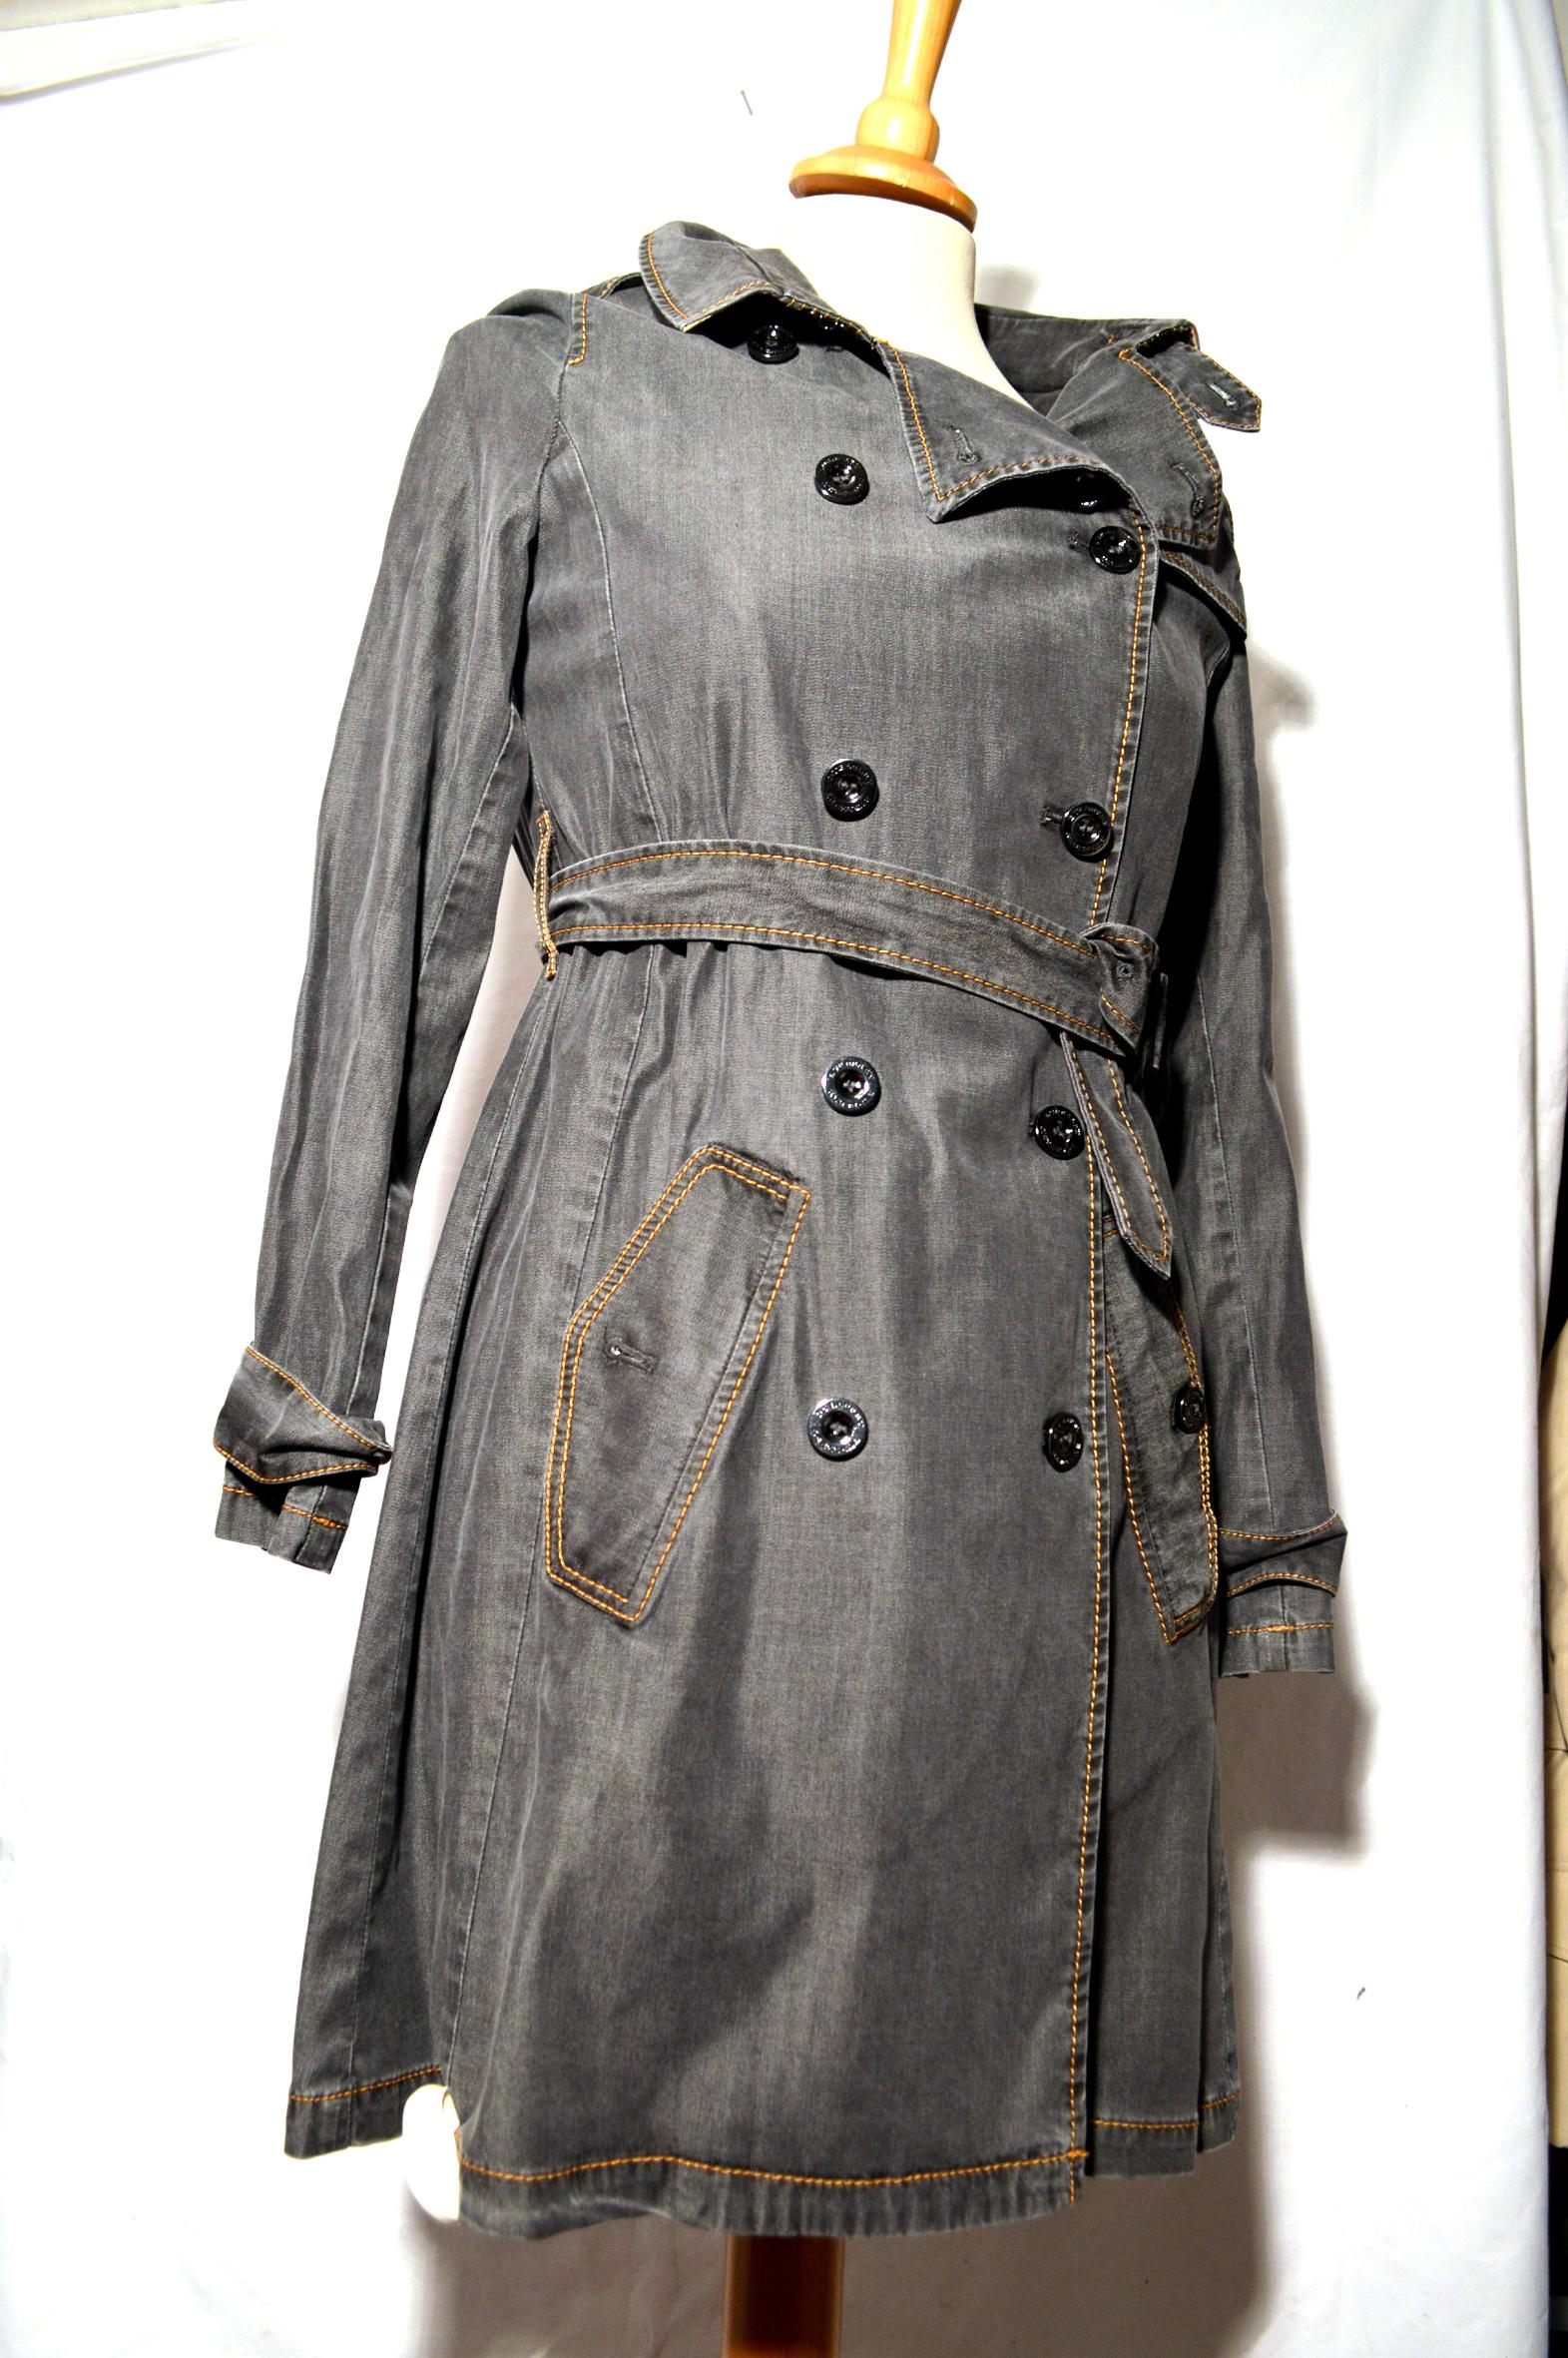 trench burberry gris taille 36 tr sor de femme d p t vente f minin. Black Bedroom Furniture Sets. Home Design Ideas